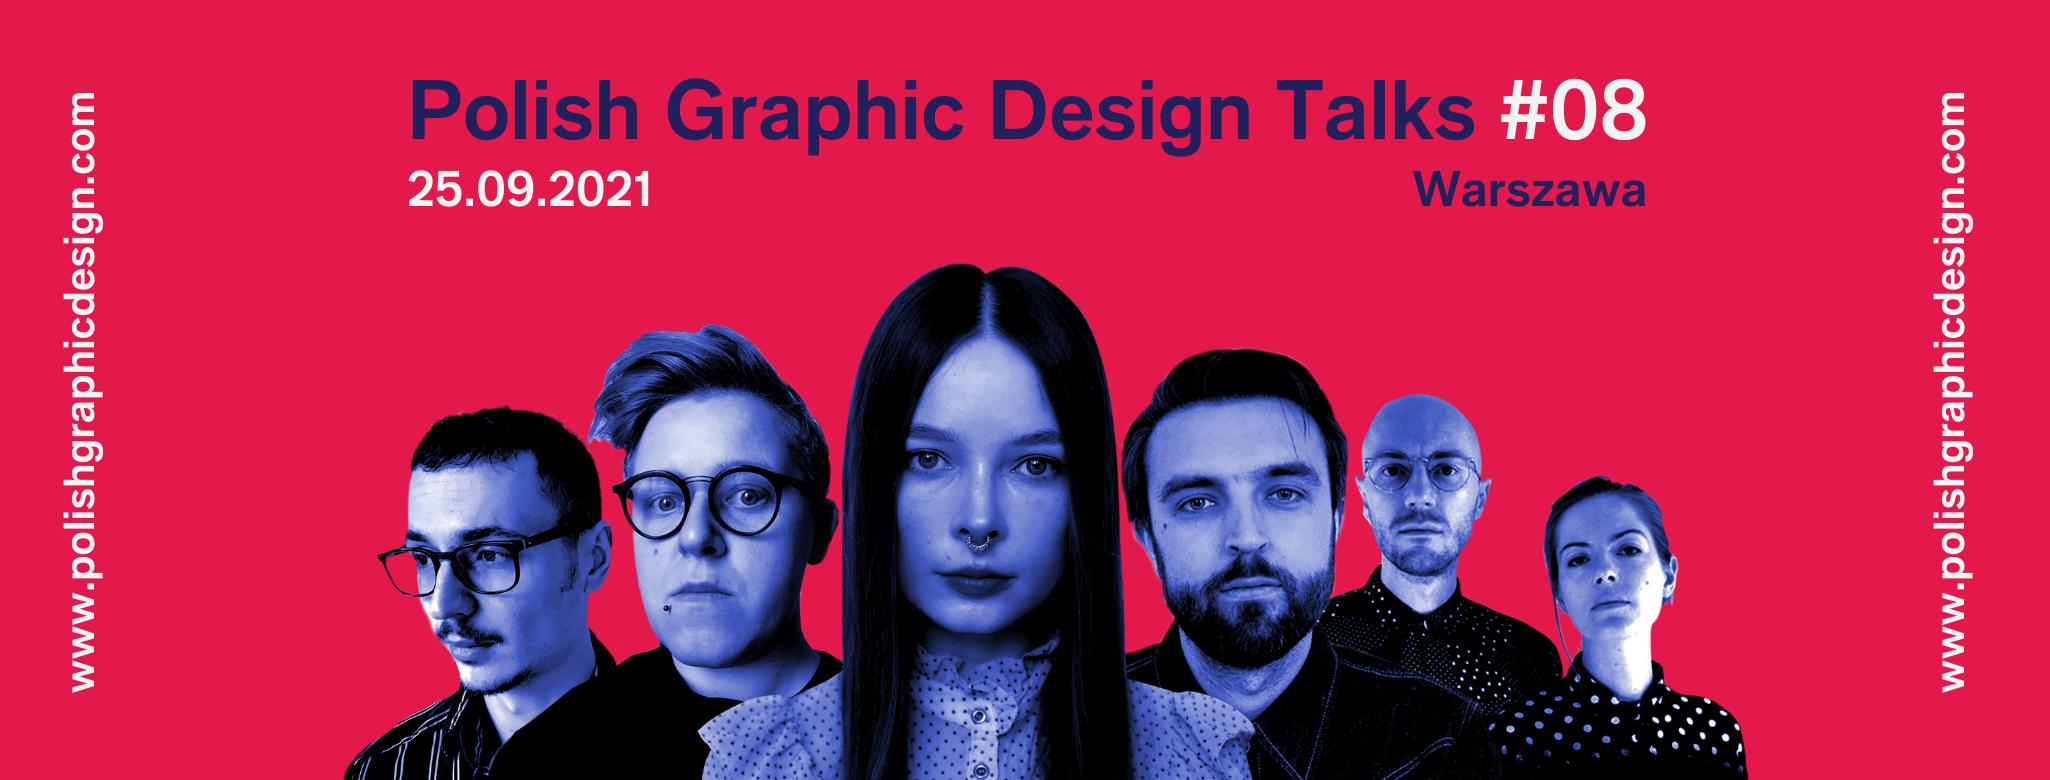 Polish Graphic Design Talks #08